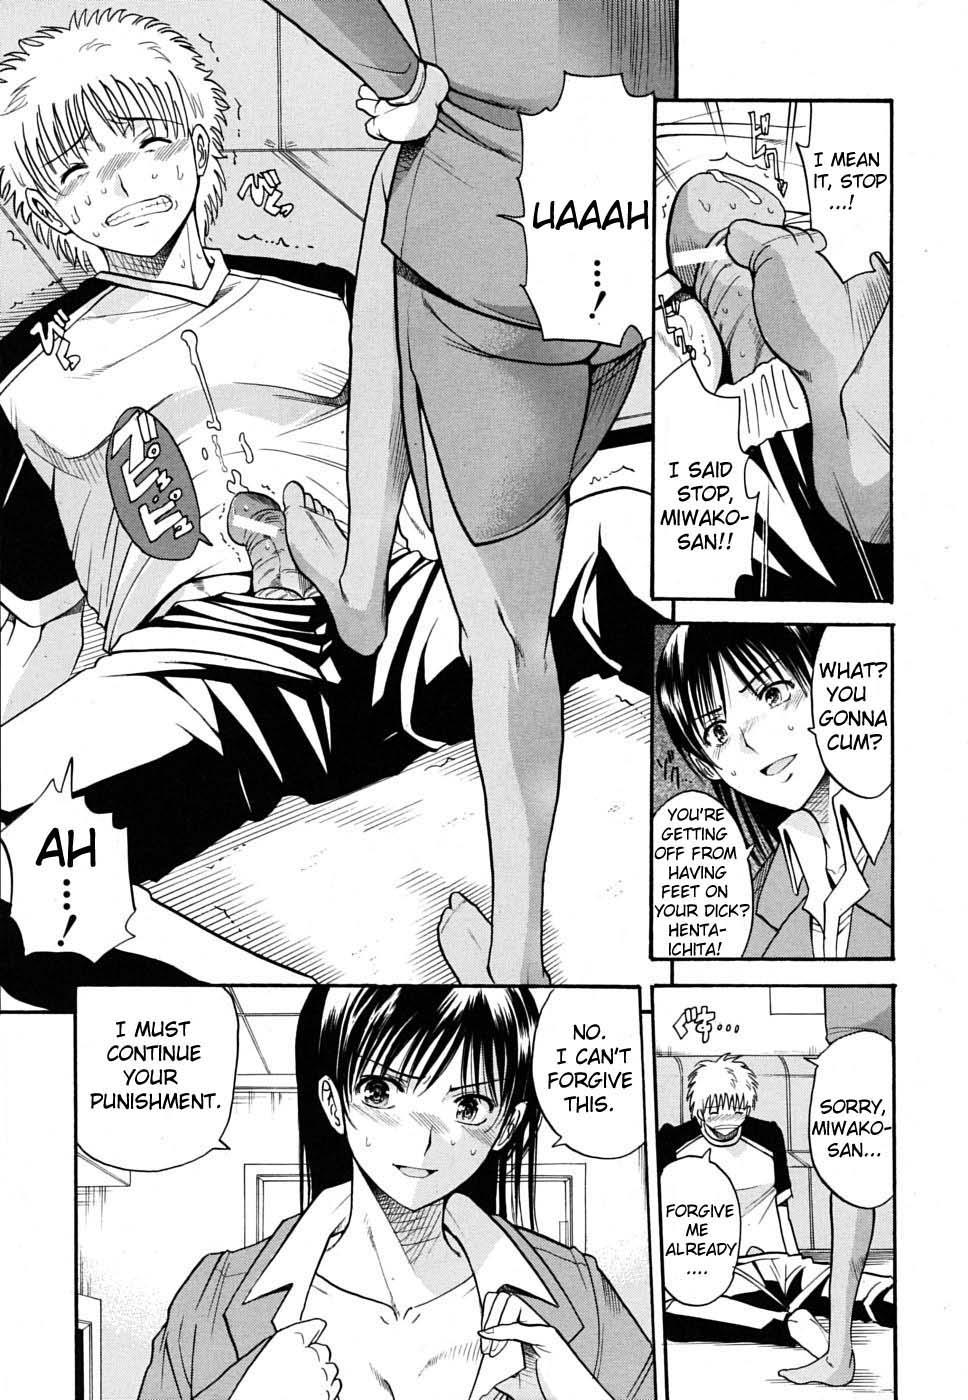 Otonari-san to no Shojijou | Secret Fling with the Neighbor 6